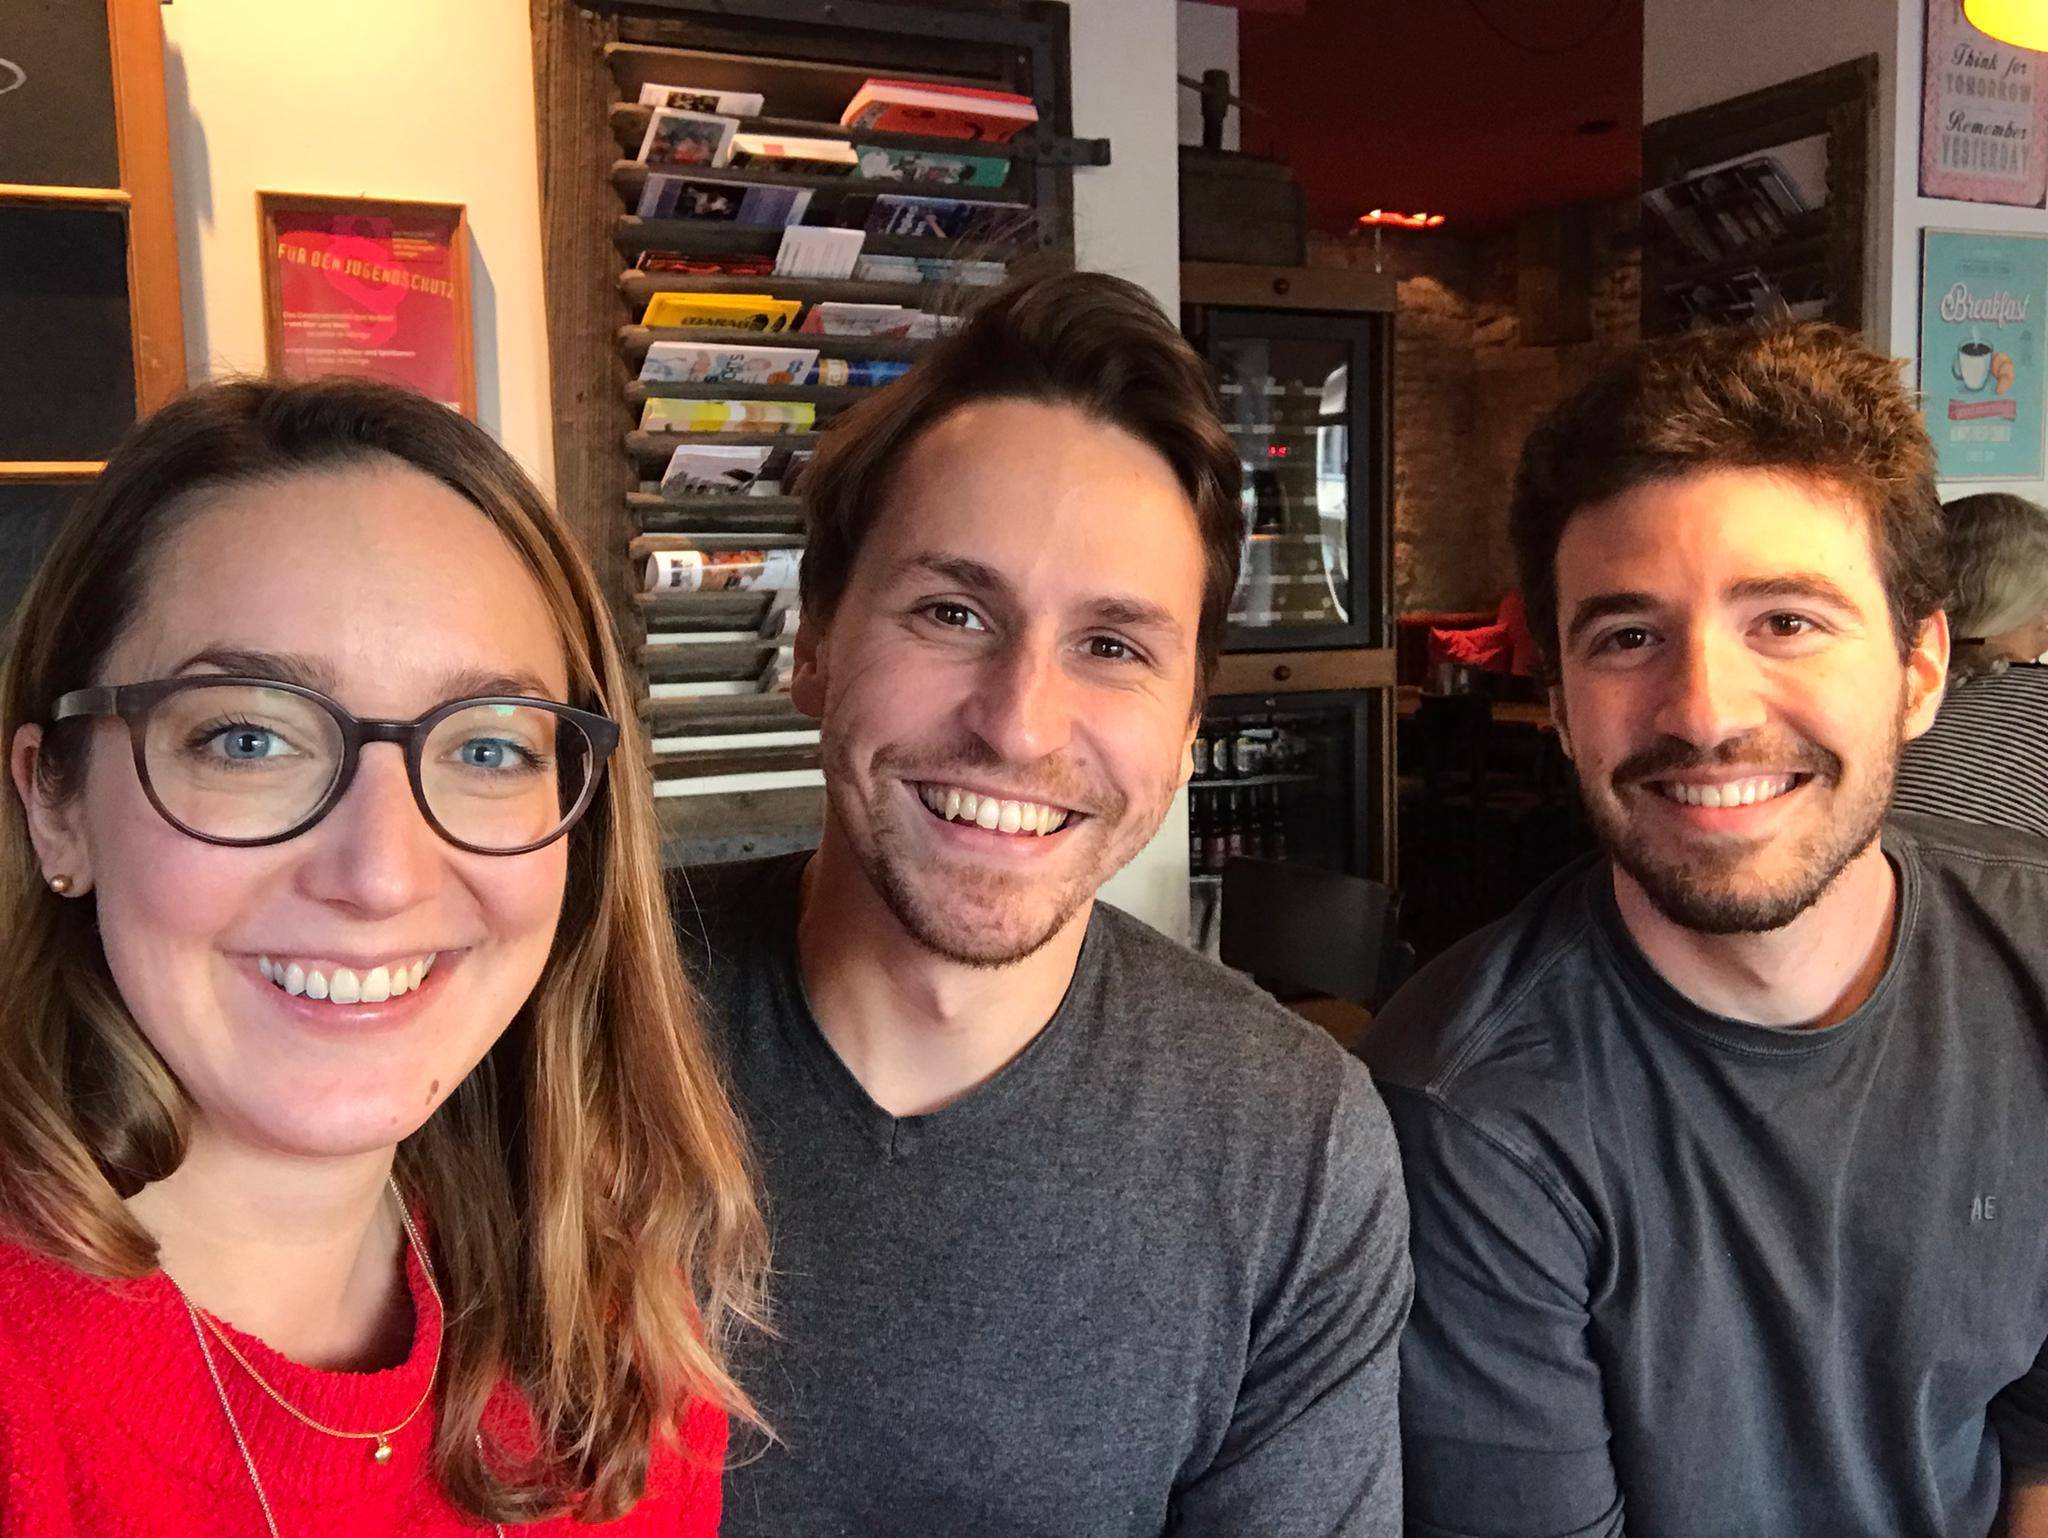 Melanie Kovacs, Rodrigo Hänggi & Daniel Puglisi